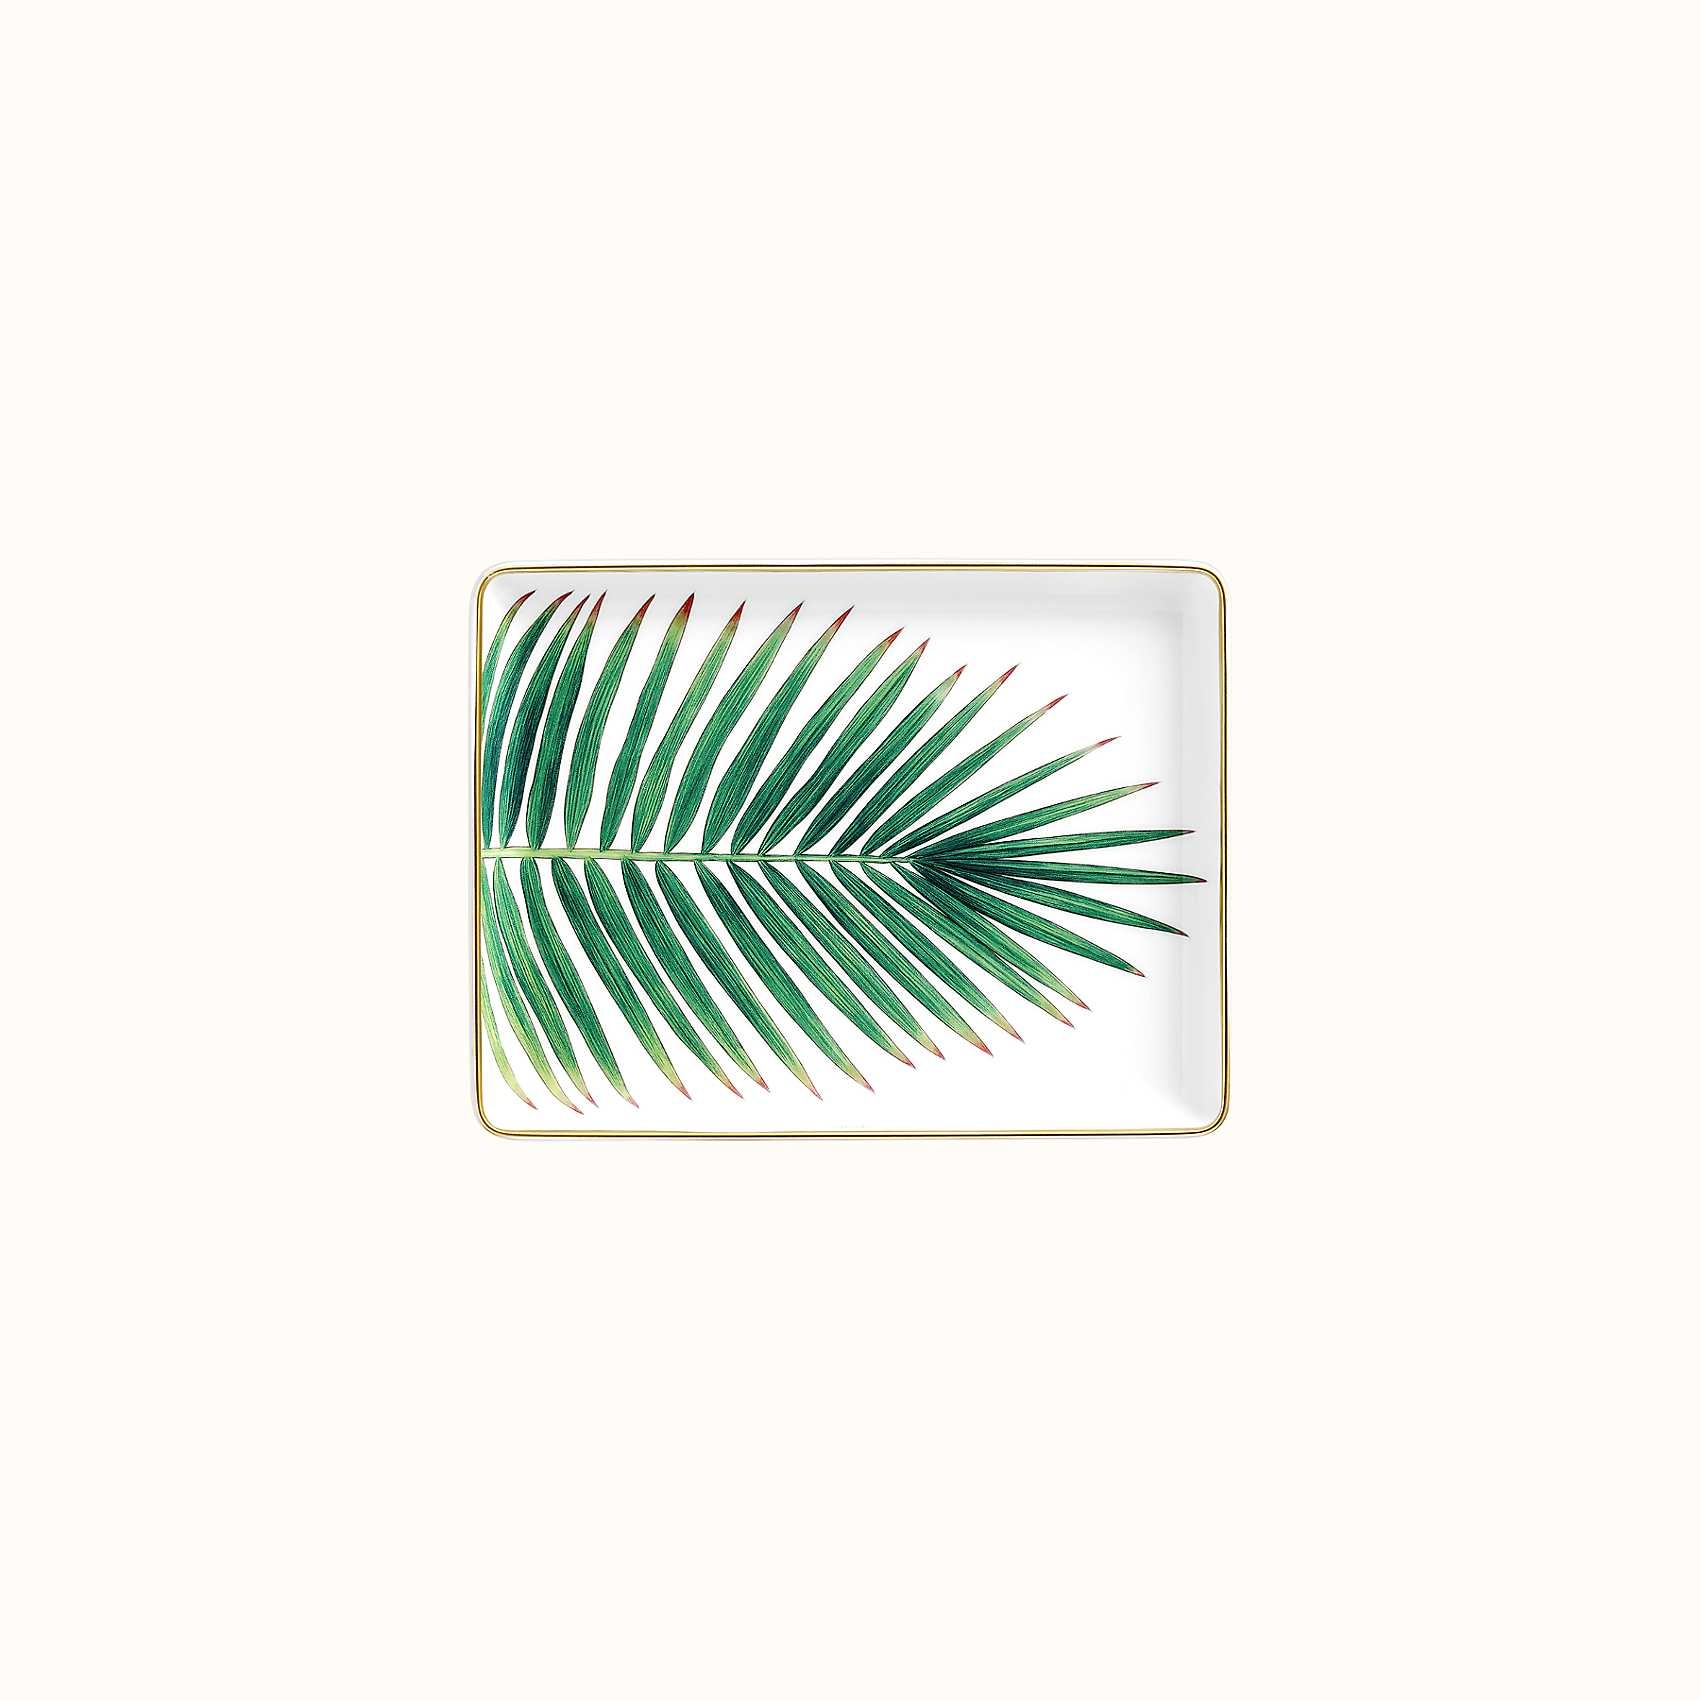 Hermes Passifolia Small Tray No 2